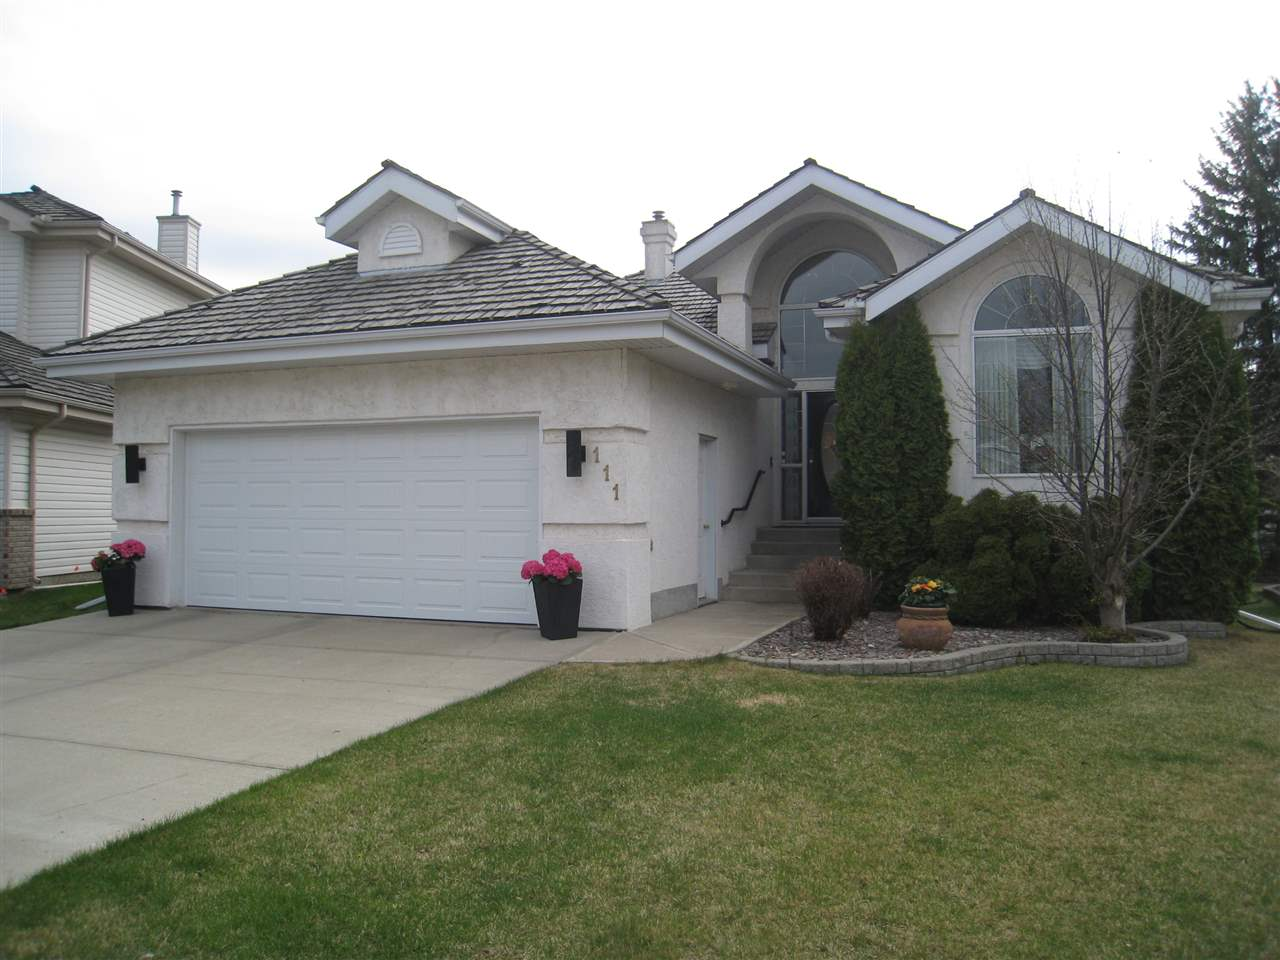 MLS® listing #E4150406 for sale located at 111 BLACKBURN Drive W